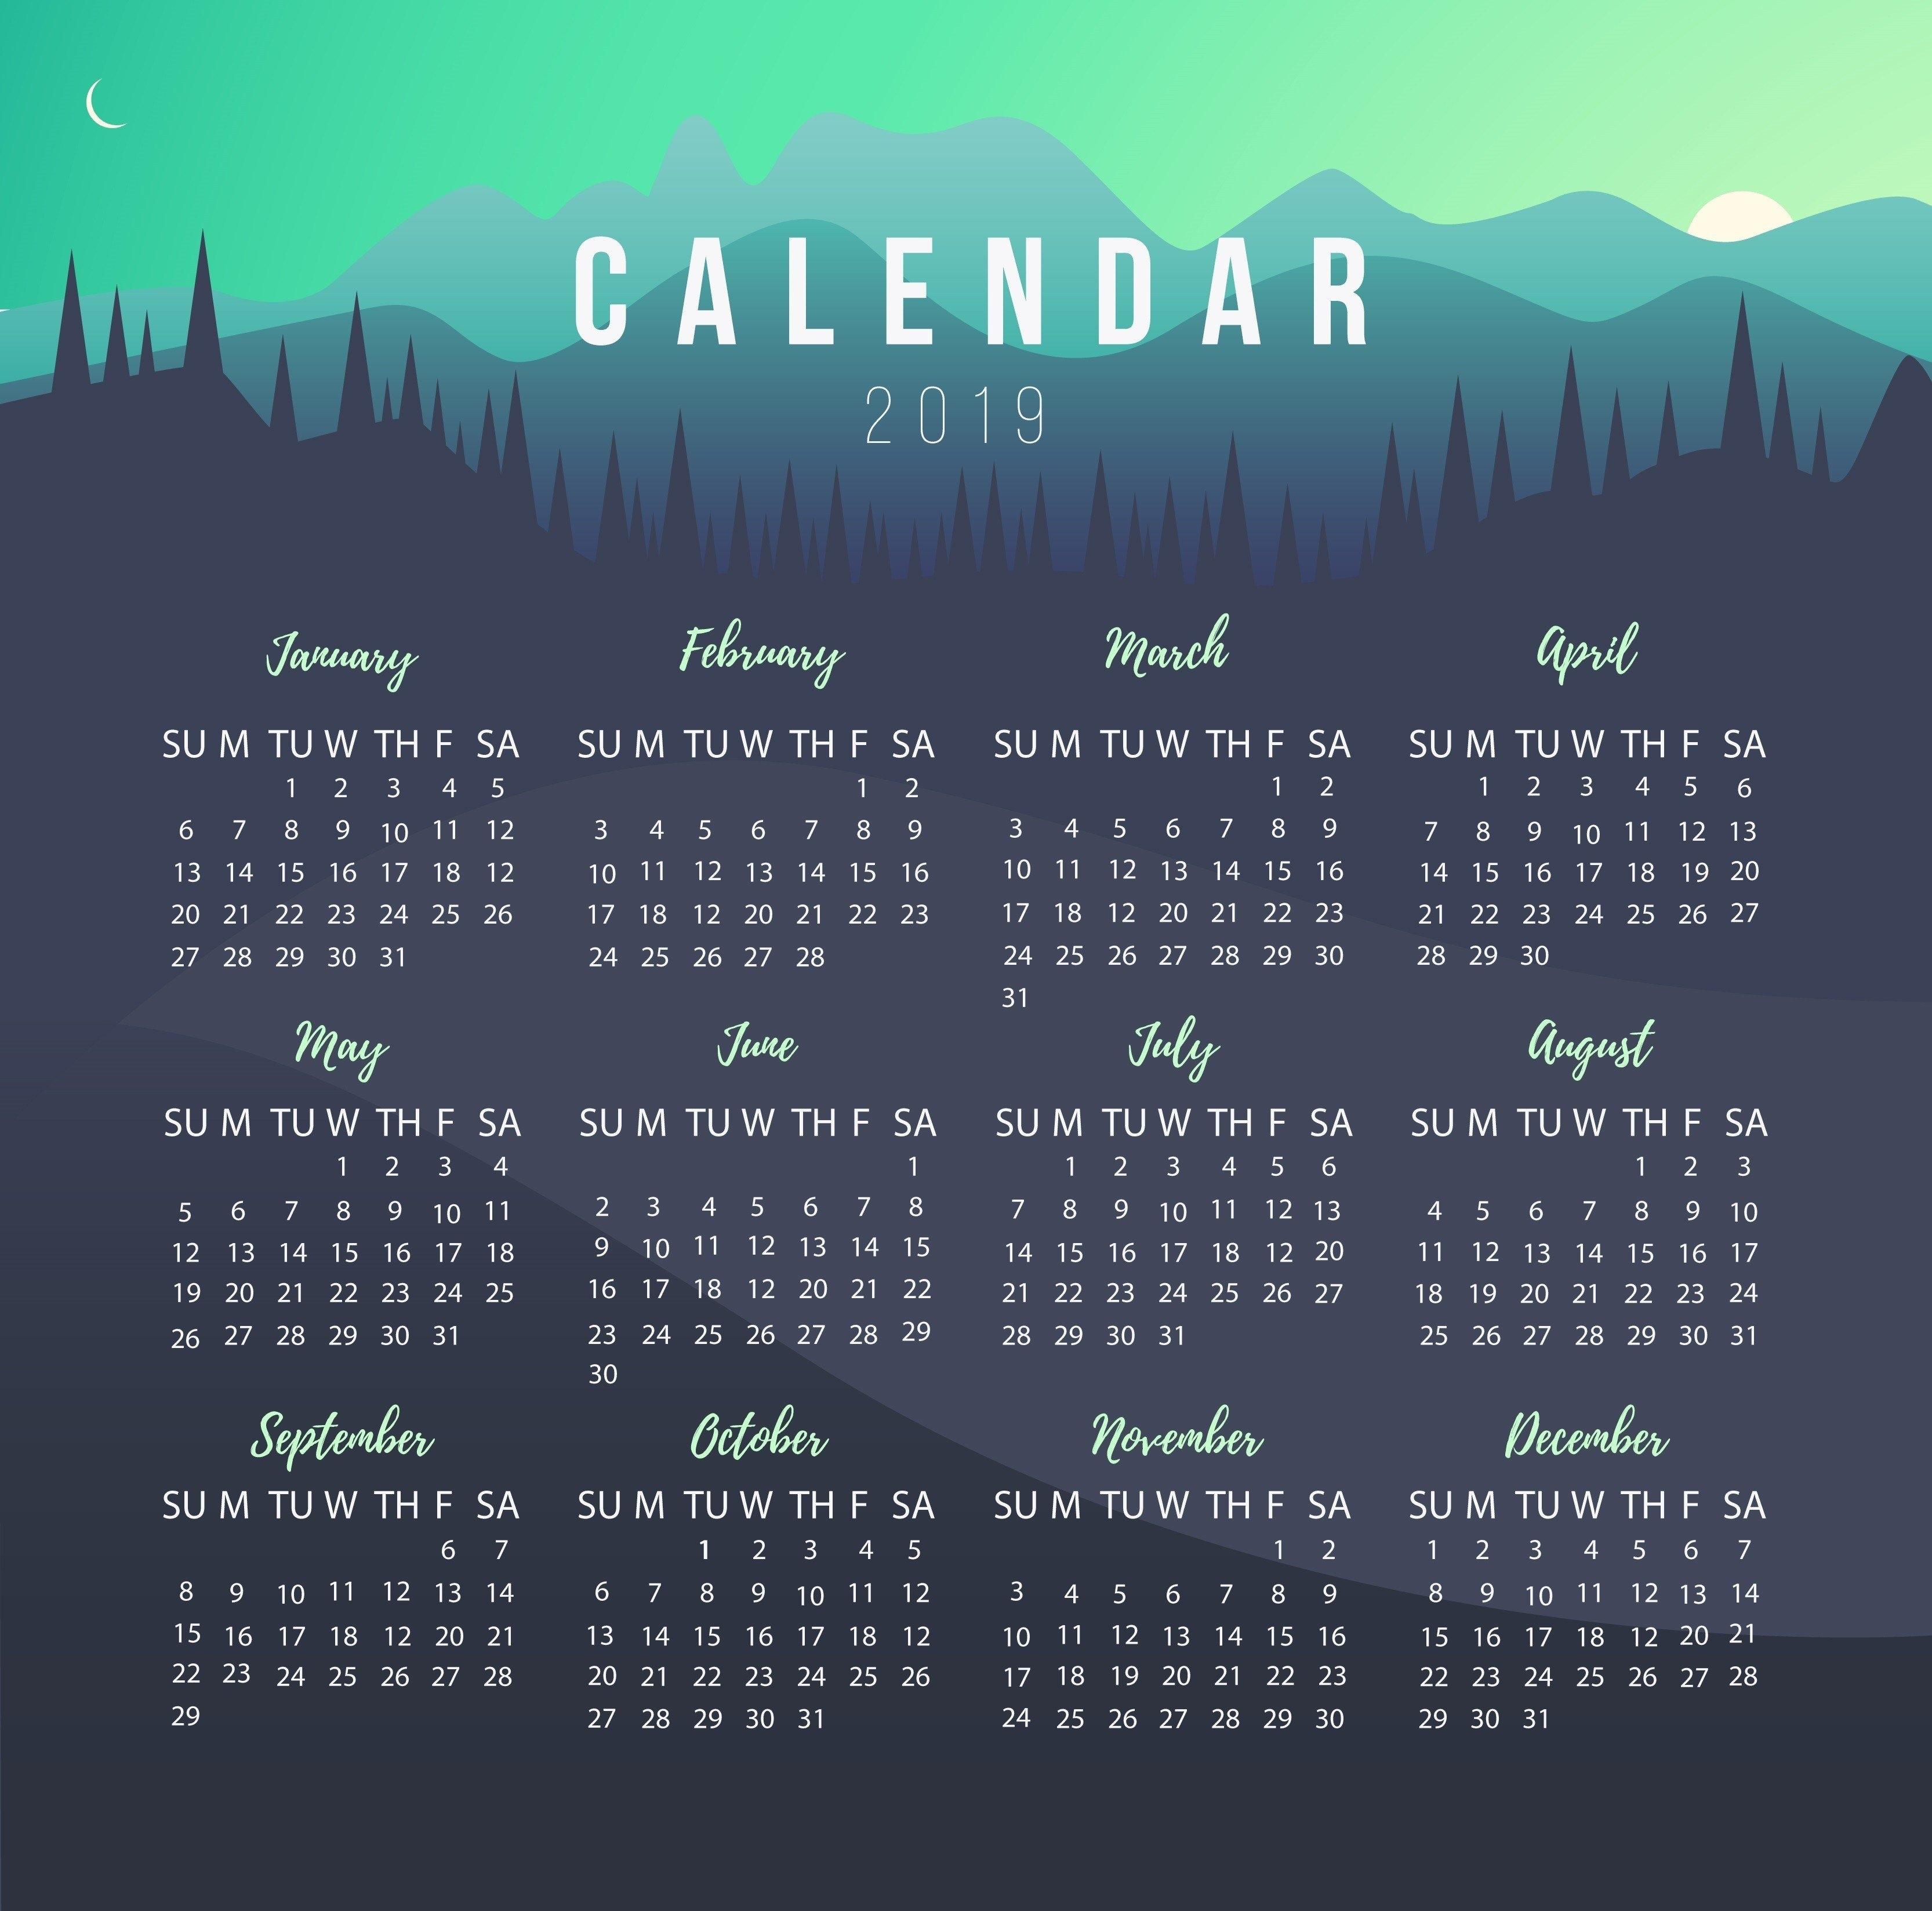 Calendar Maker In The Philippines | Dotph The Official Domain Name Calendar 2019 Maker